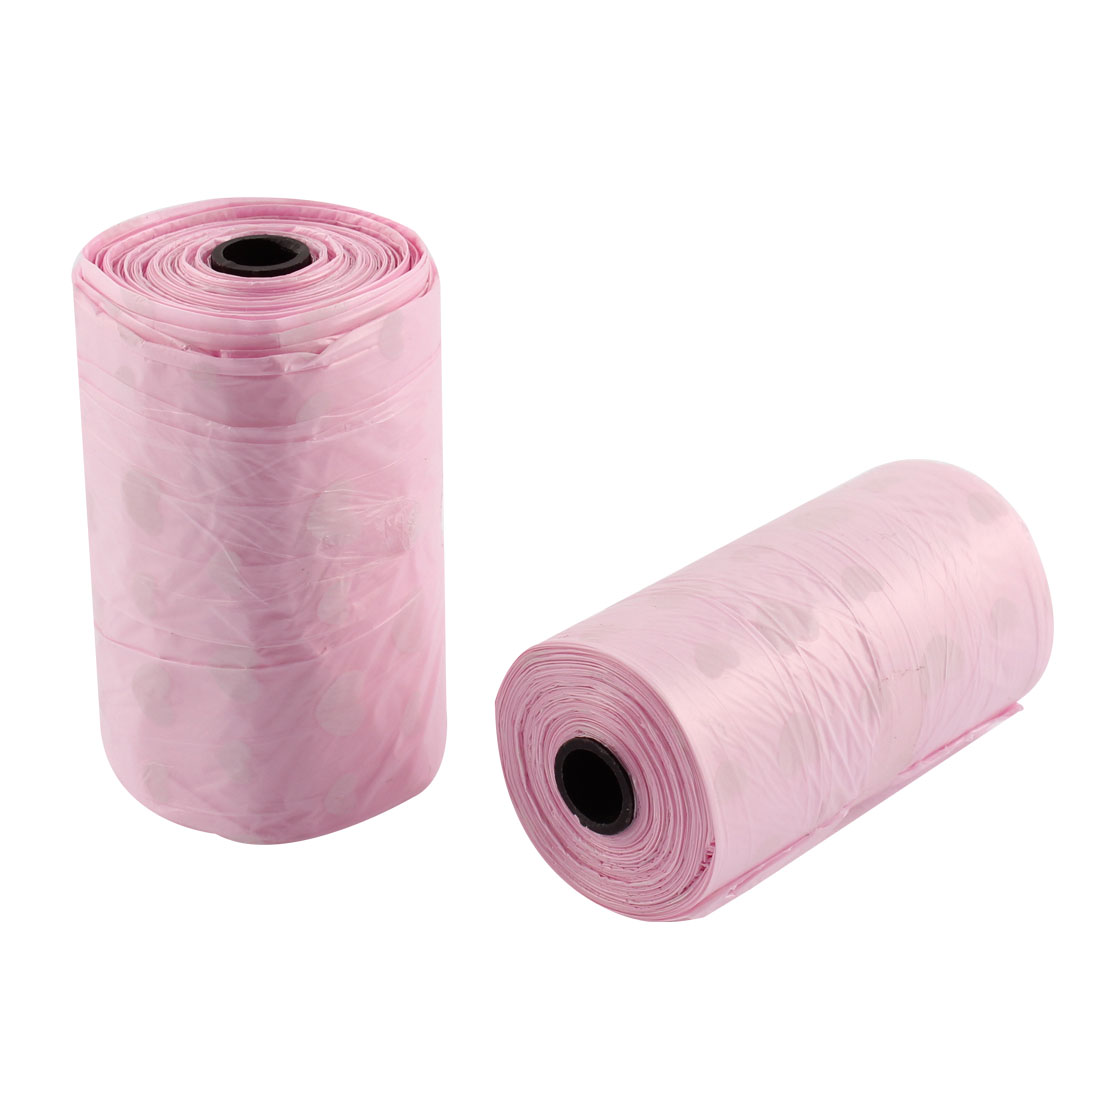 2PCS Car Interior Disposable Garbage Trash Waste Bag Roll Pink 30cm x 20cm